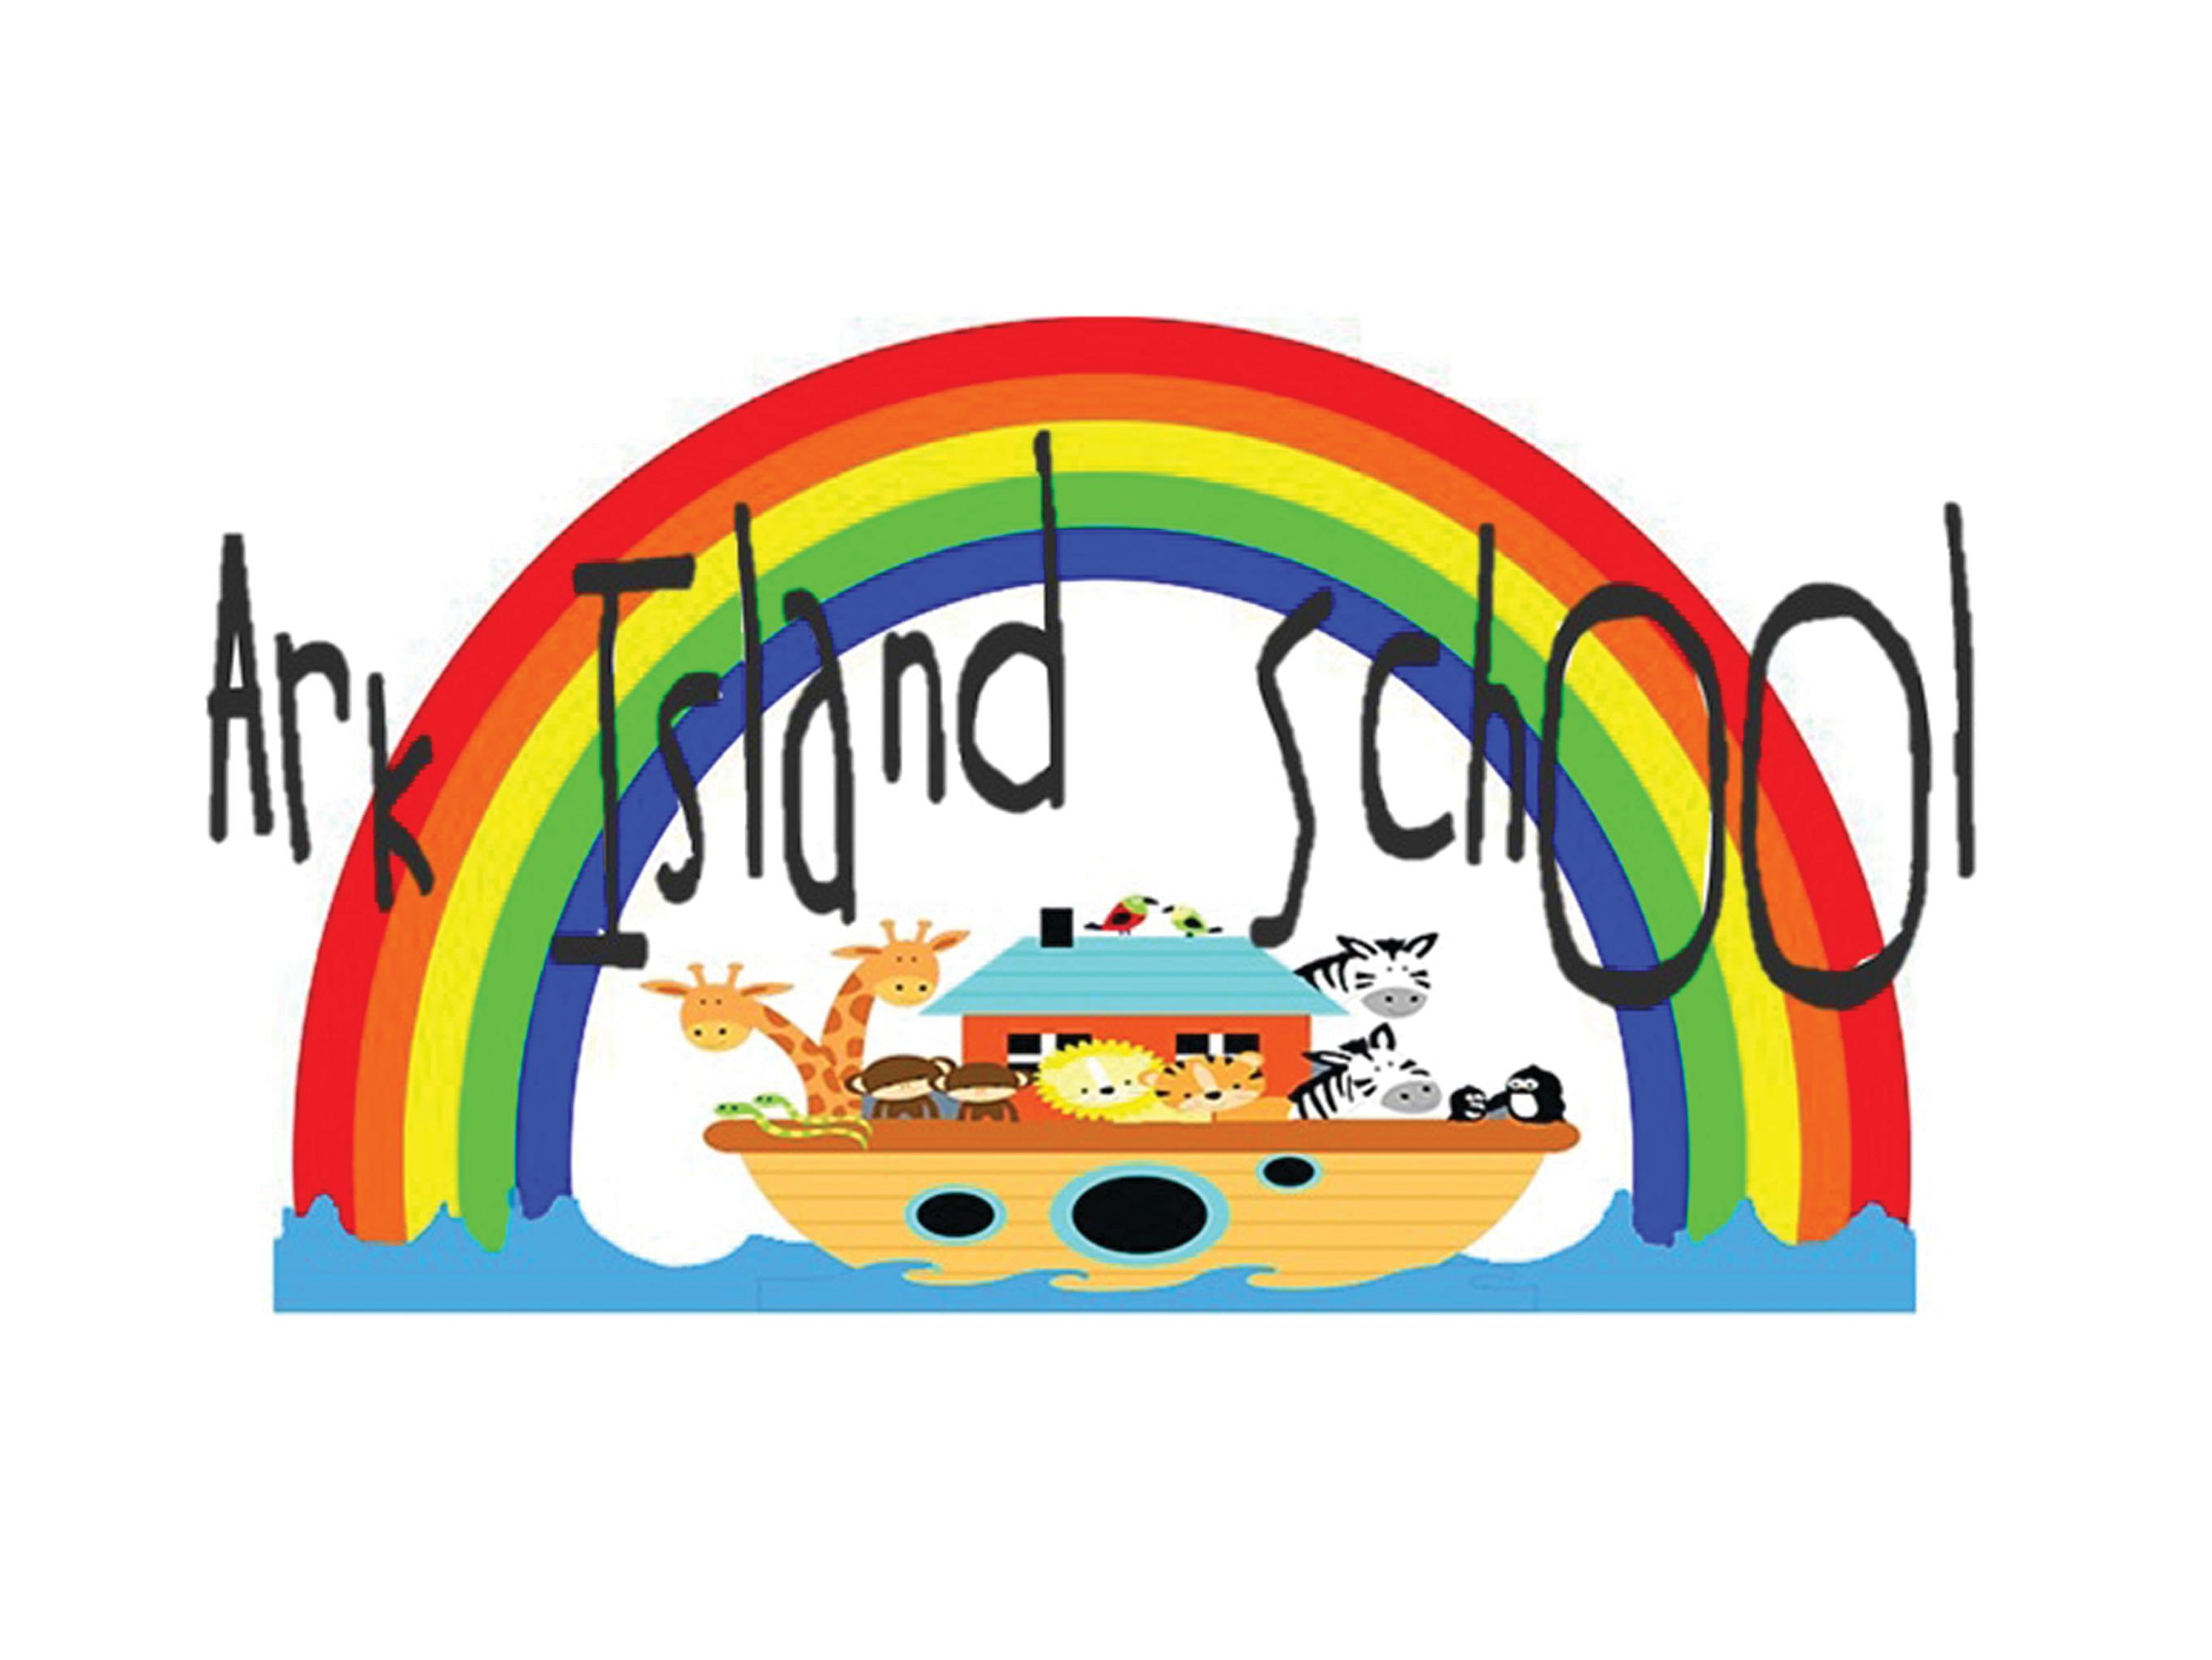 01. ARK ISLAND SCHOOL, INC.